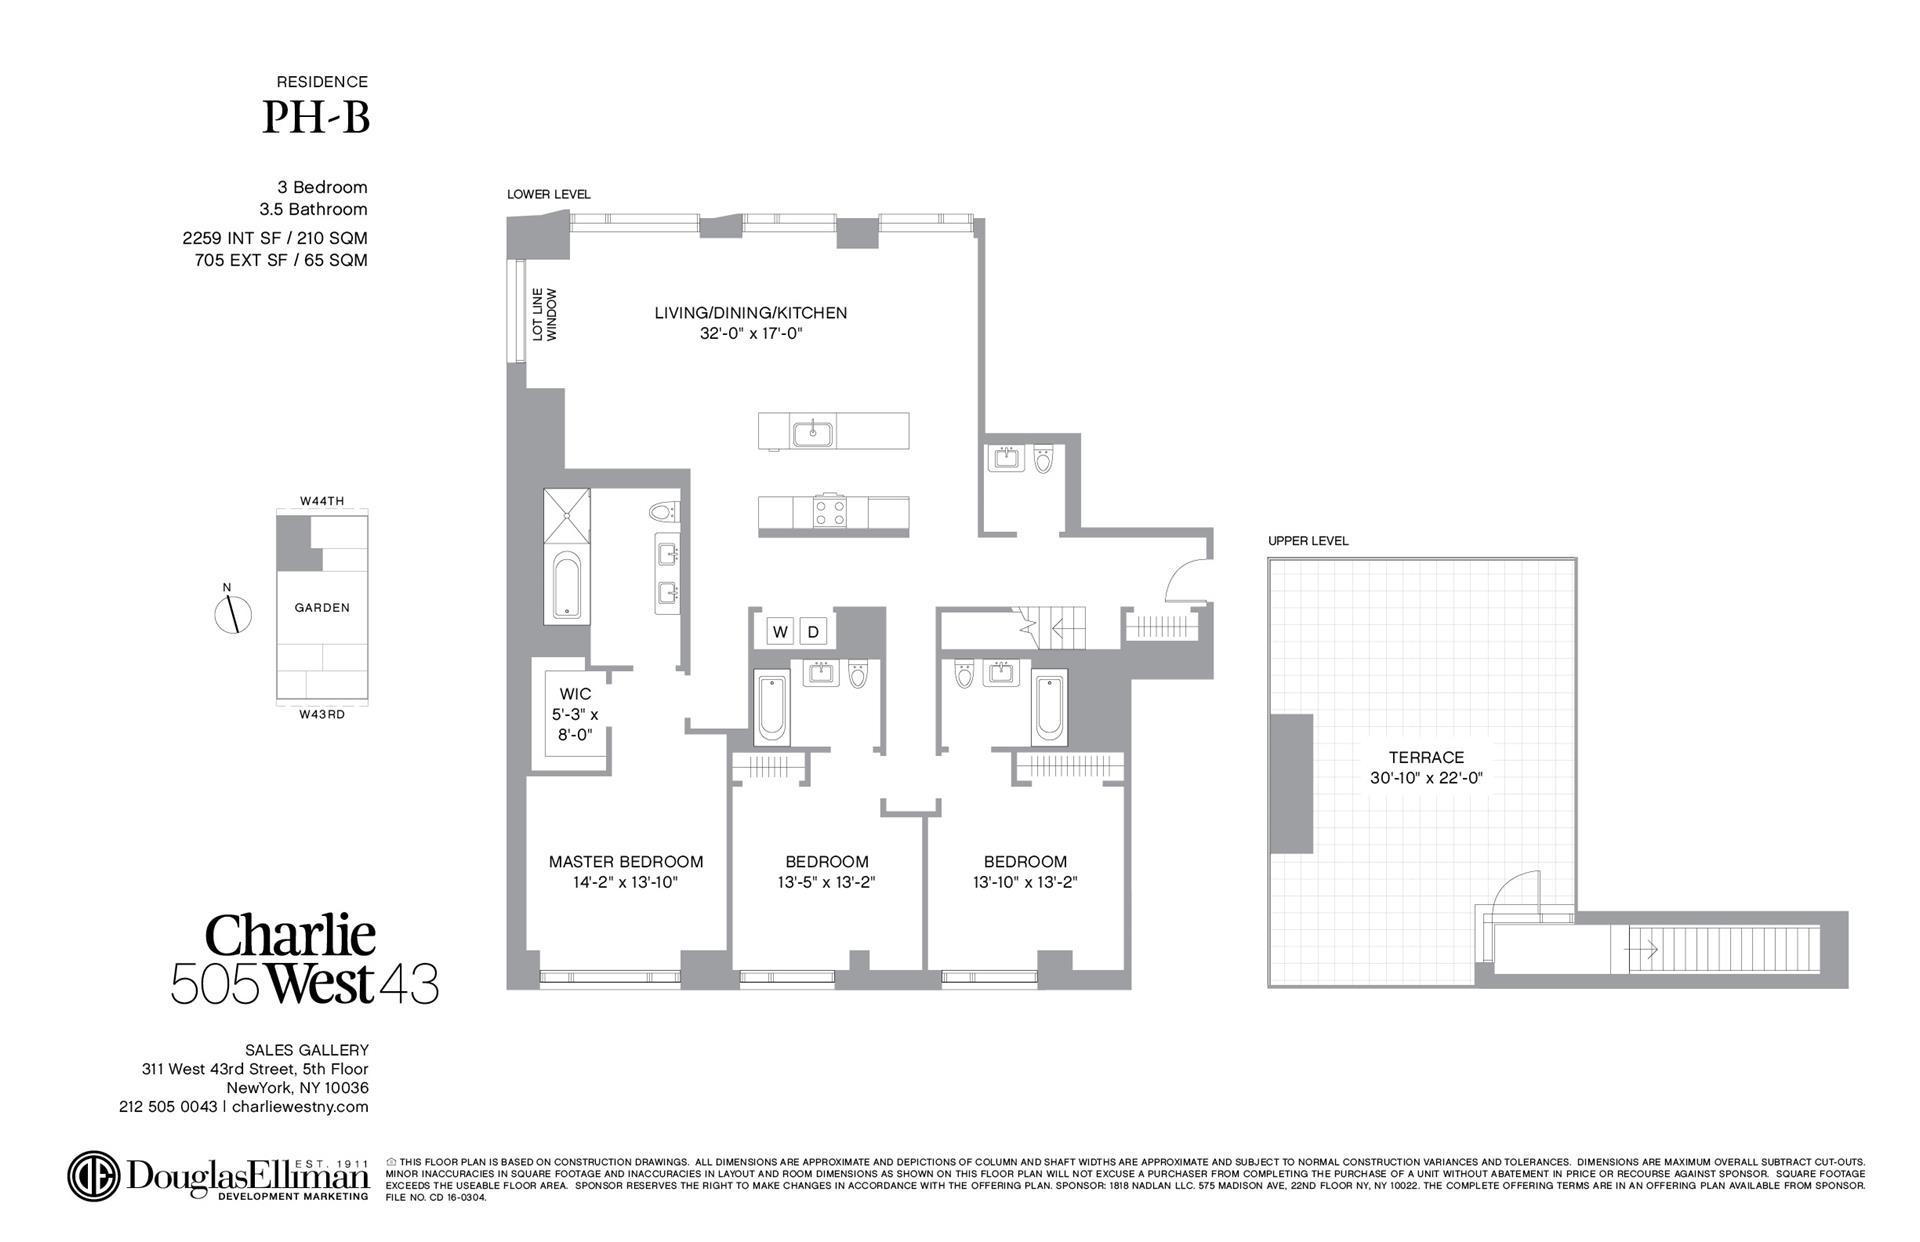 Floor plan of 505 West 43rd St, PHB - Clinton, New York